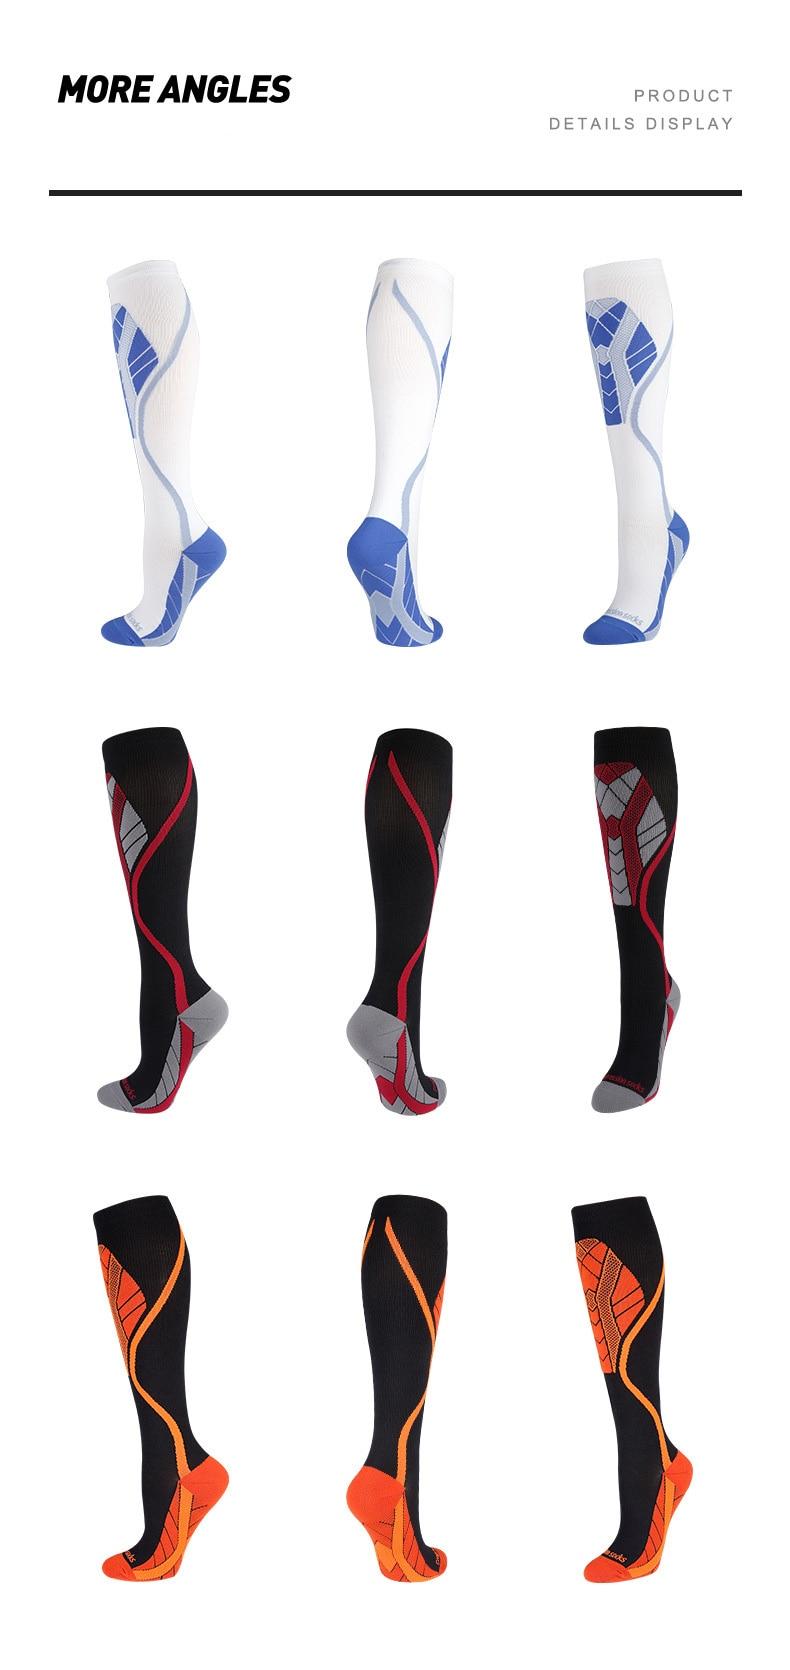 Men/Women Dropship Compression Stockings Socks Pack Unisex Sports Socks Lot Prevent Varicose Veins Nurse Socks Football Running